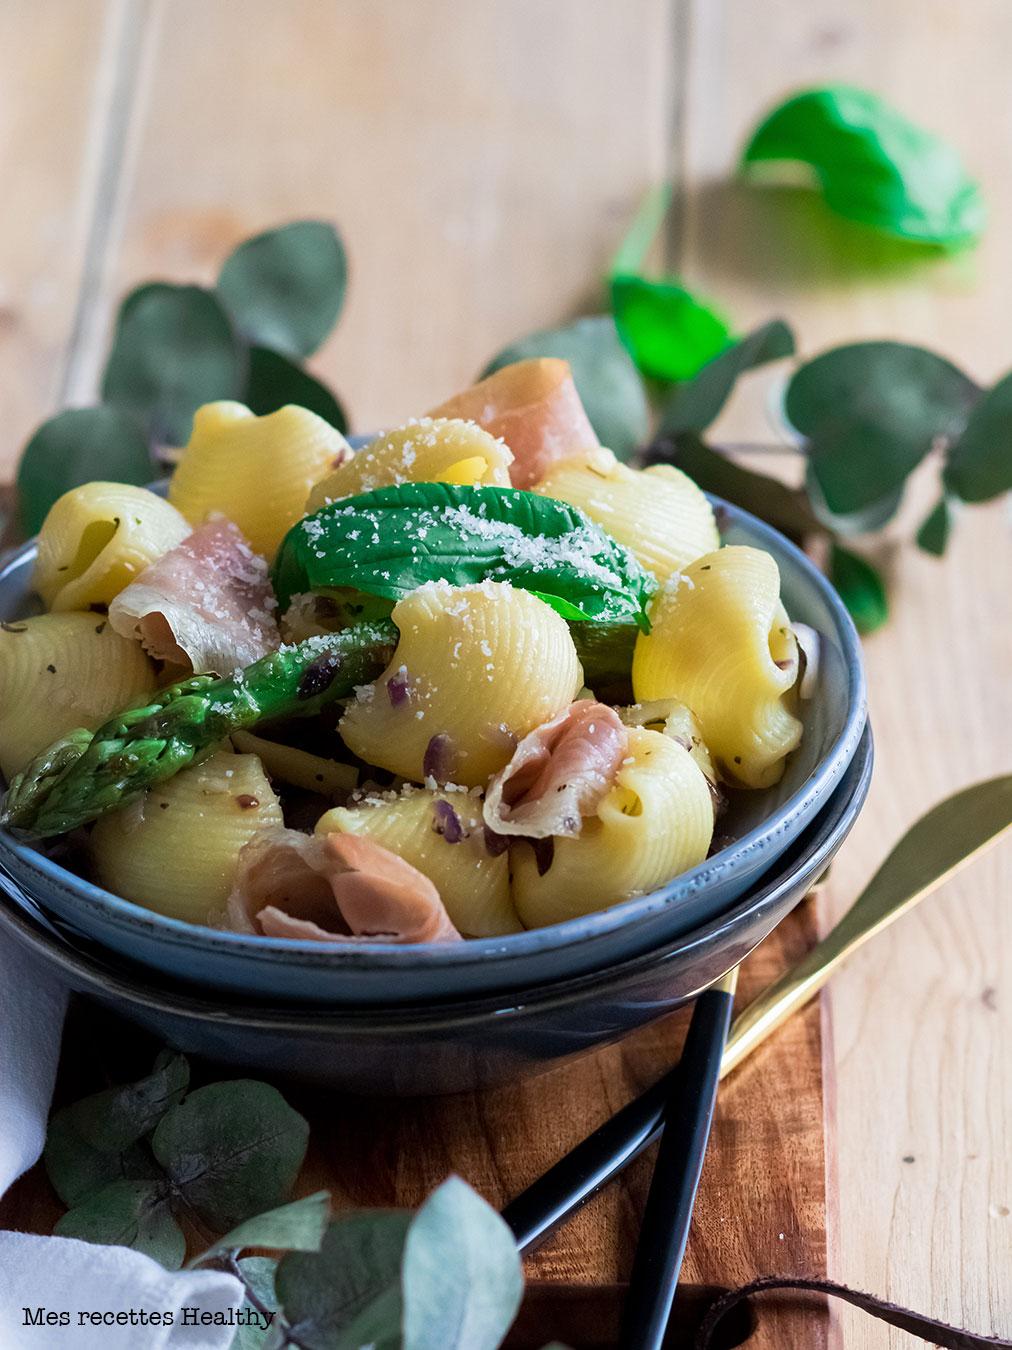 recette healthy-lumaconi -asperge-jambon sec